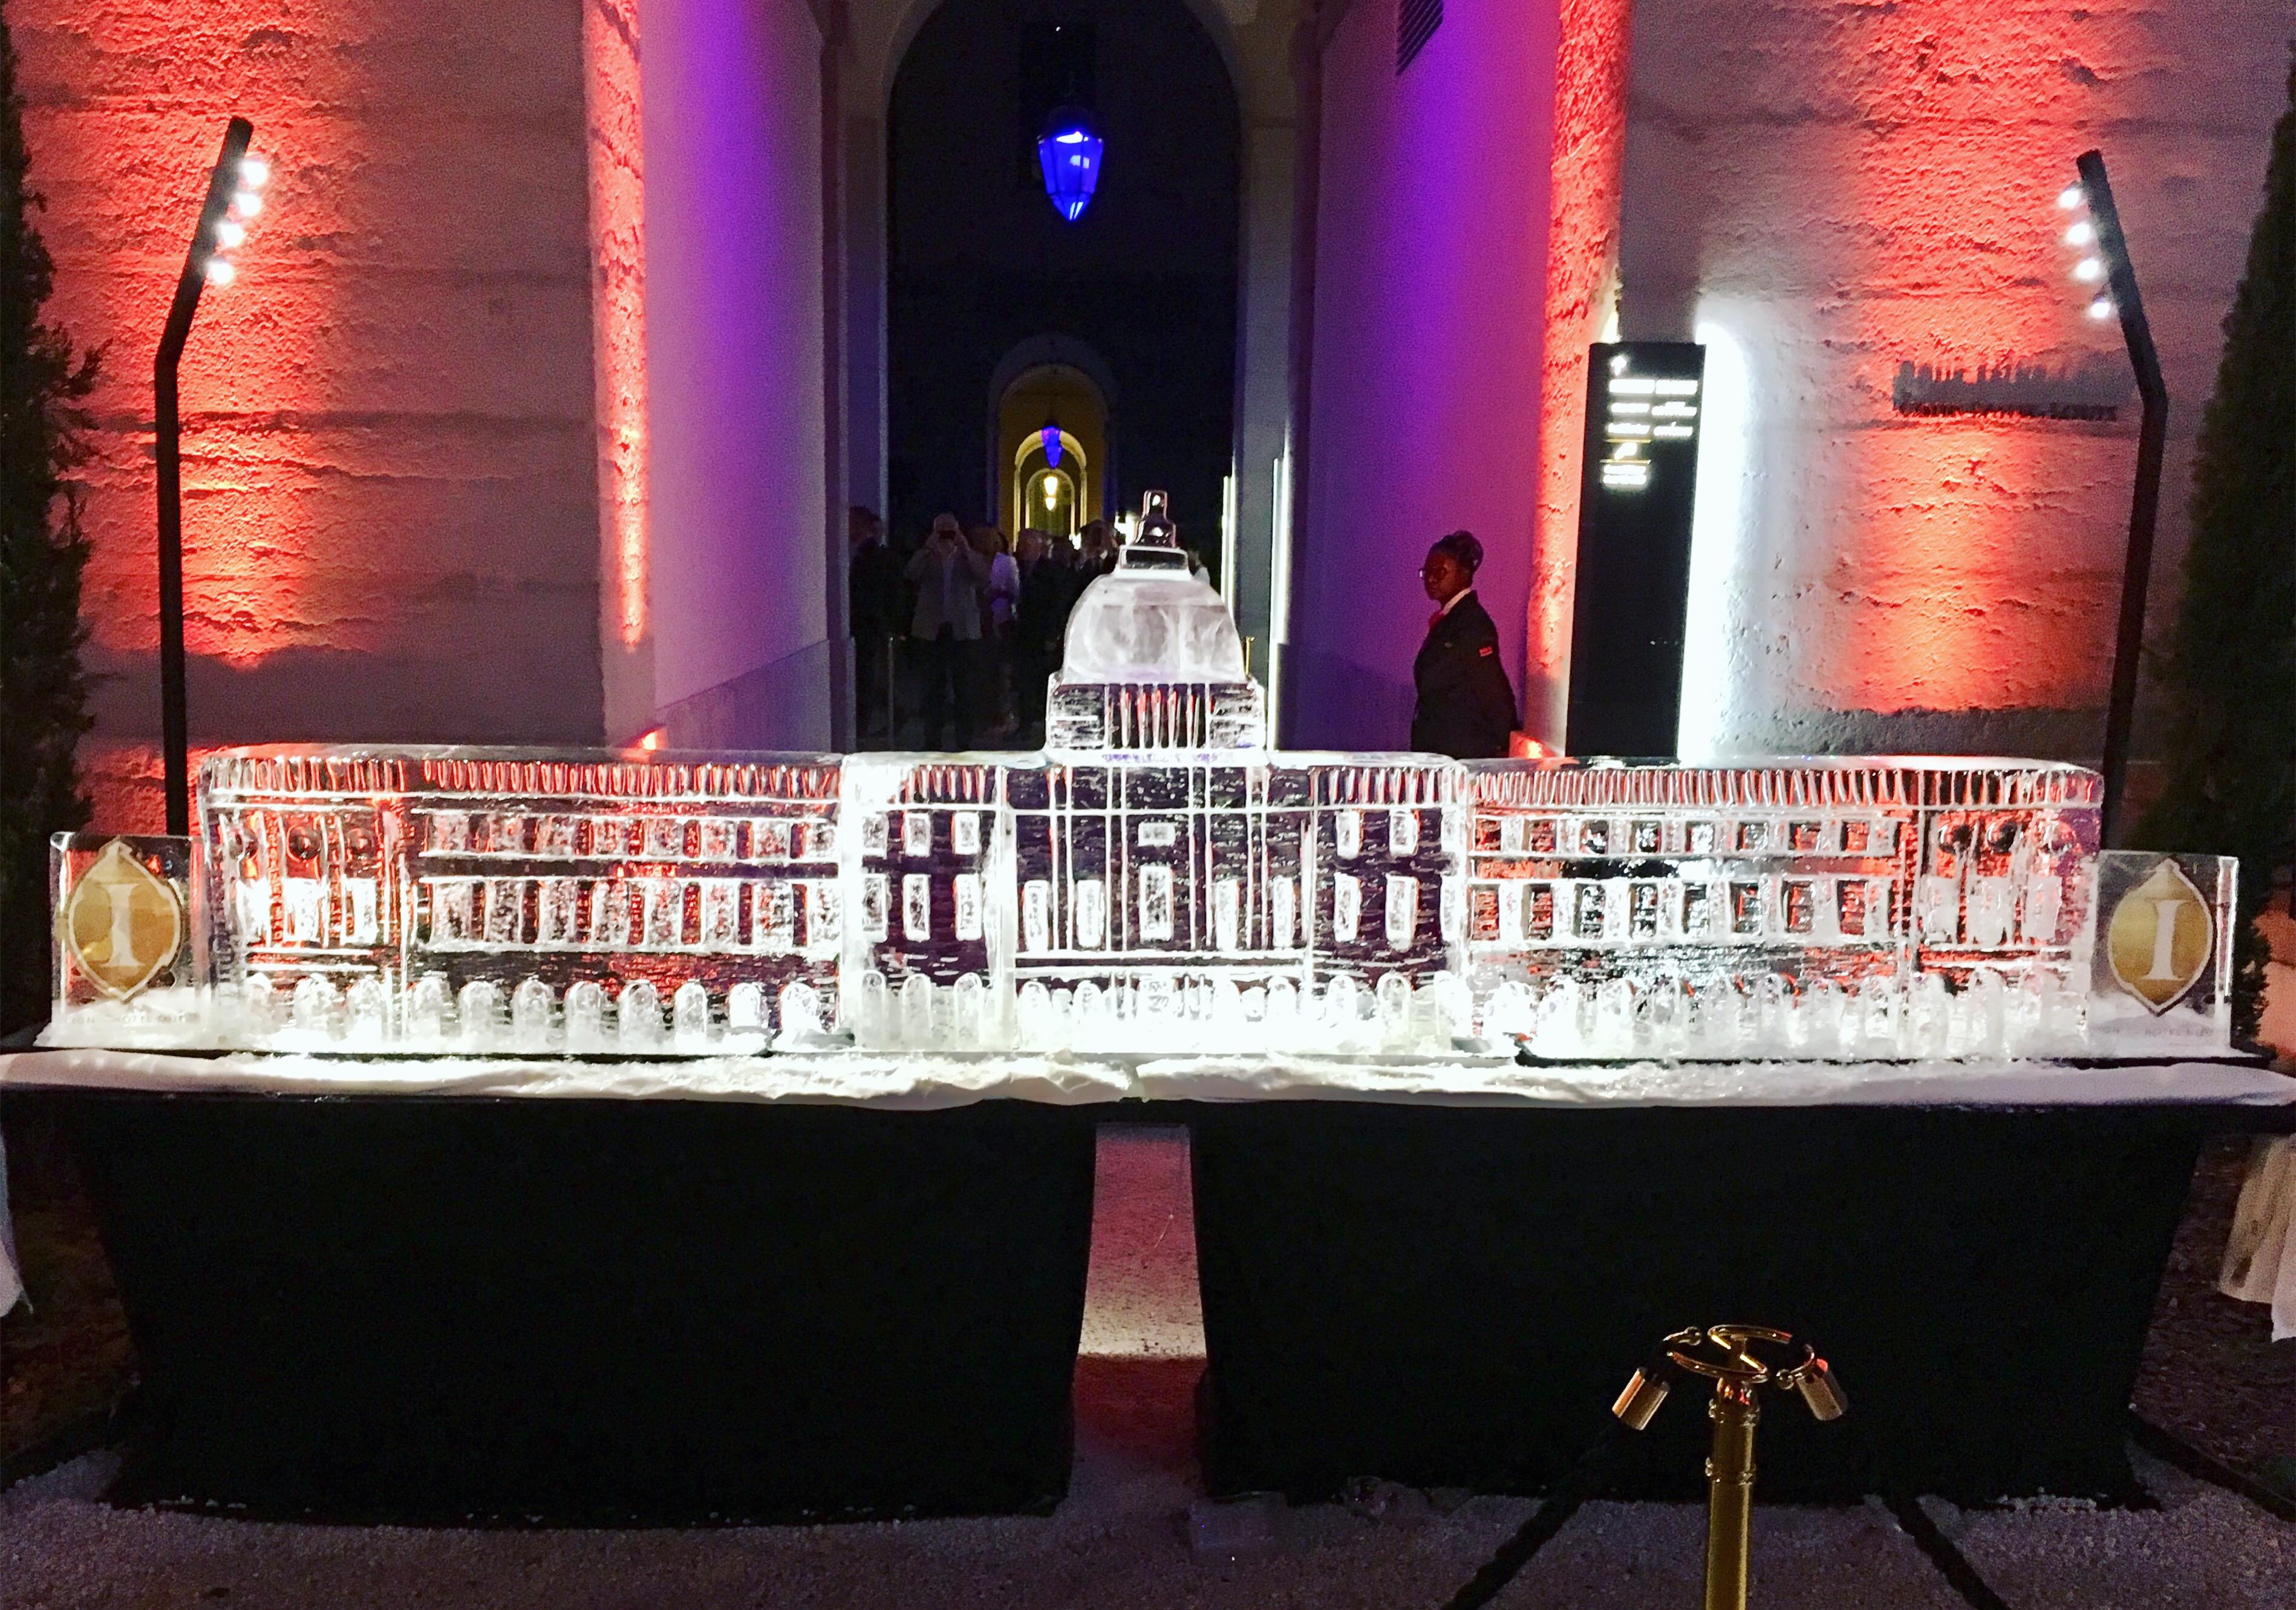 Ice sculpture.